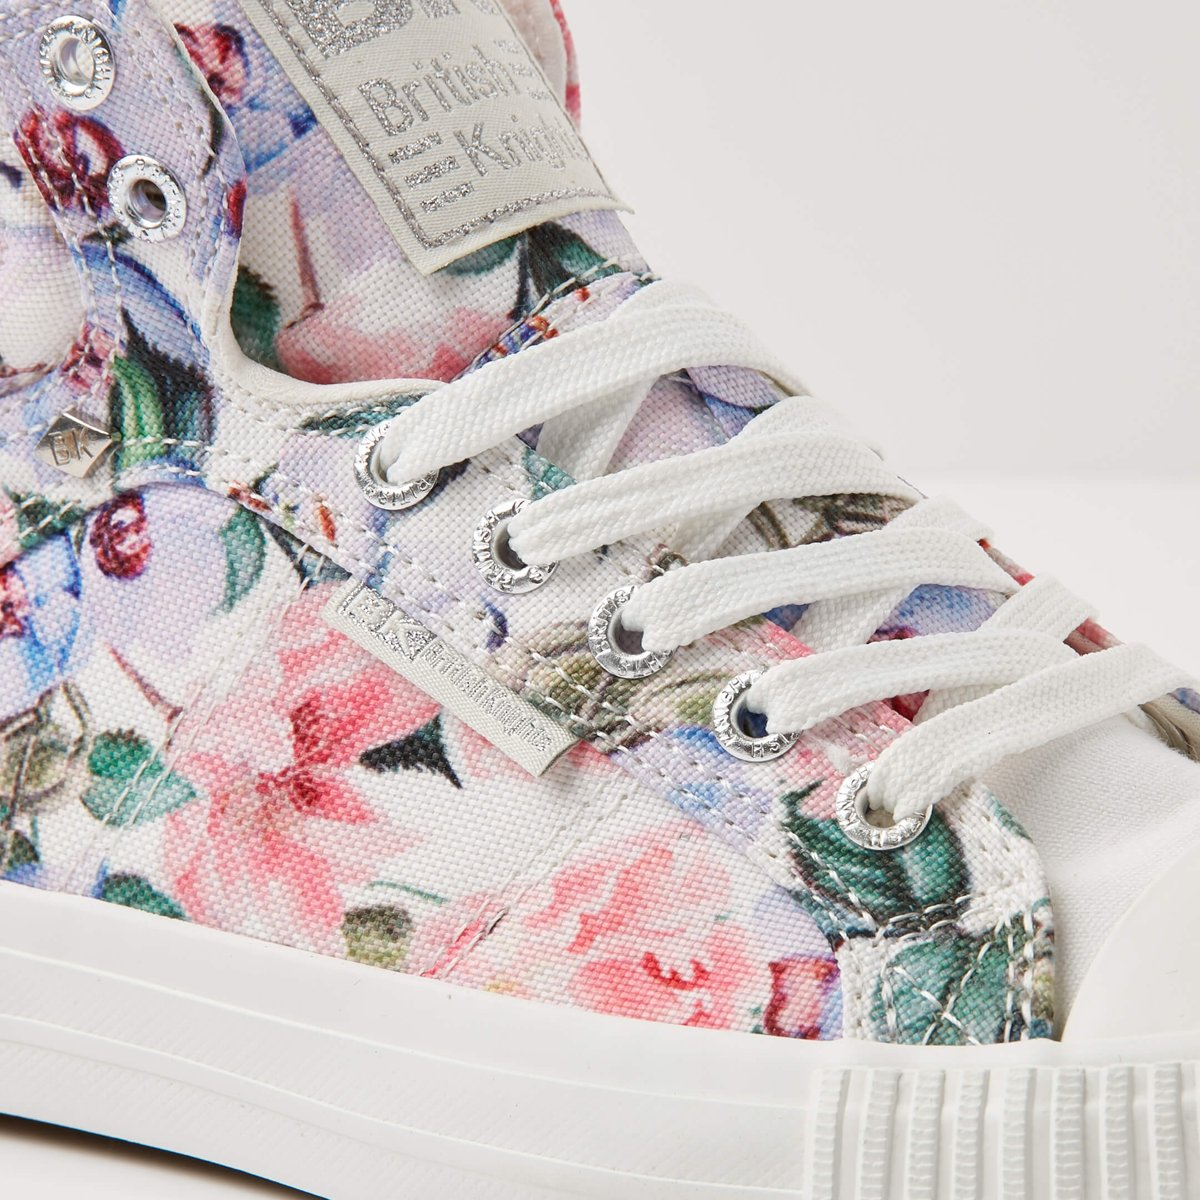 1d0aba56438 bol.com | British Knights DEE Dames sneakers hoog - Lila bloemen - maat 40